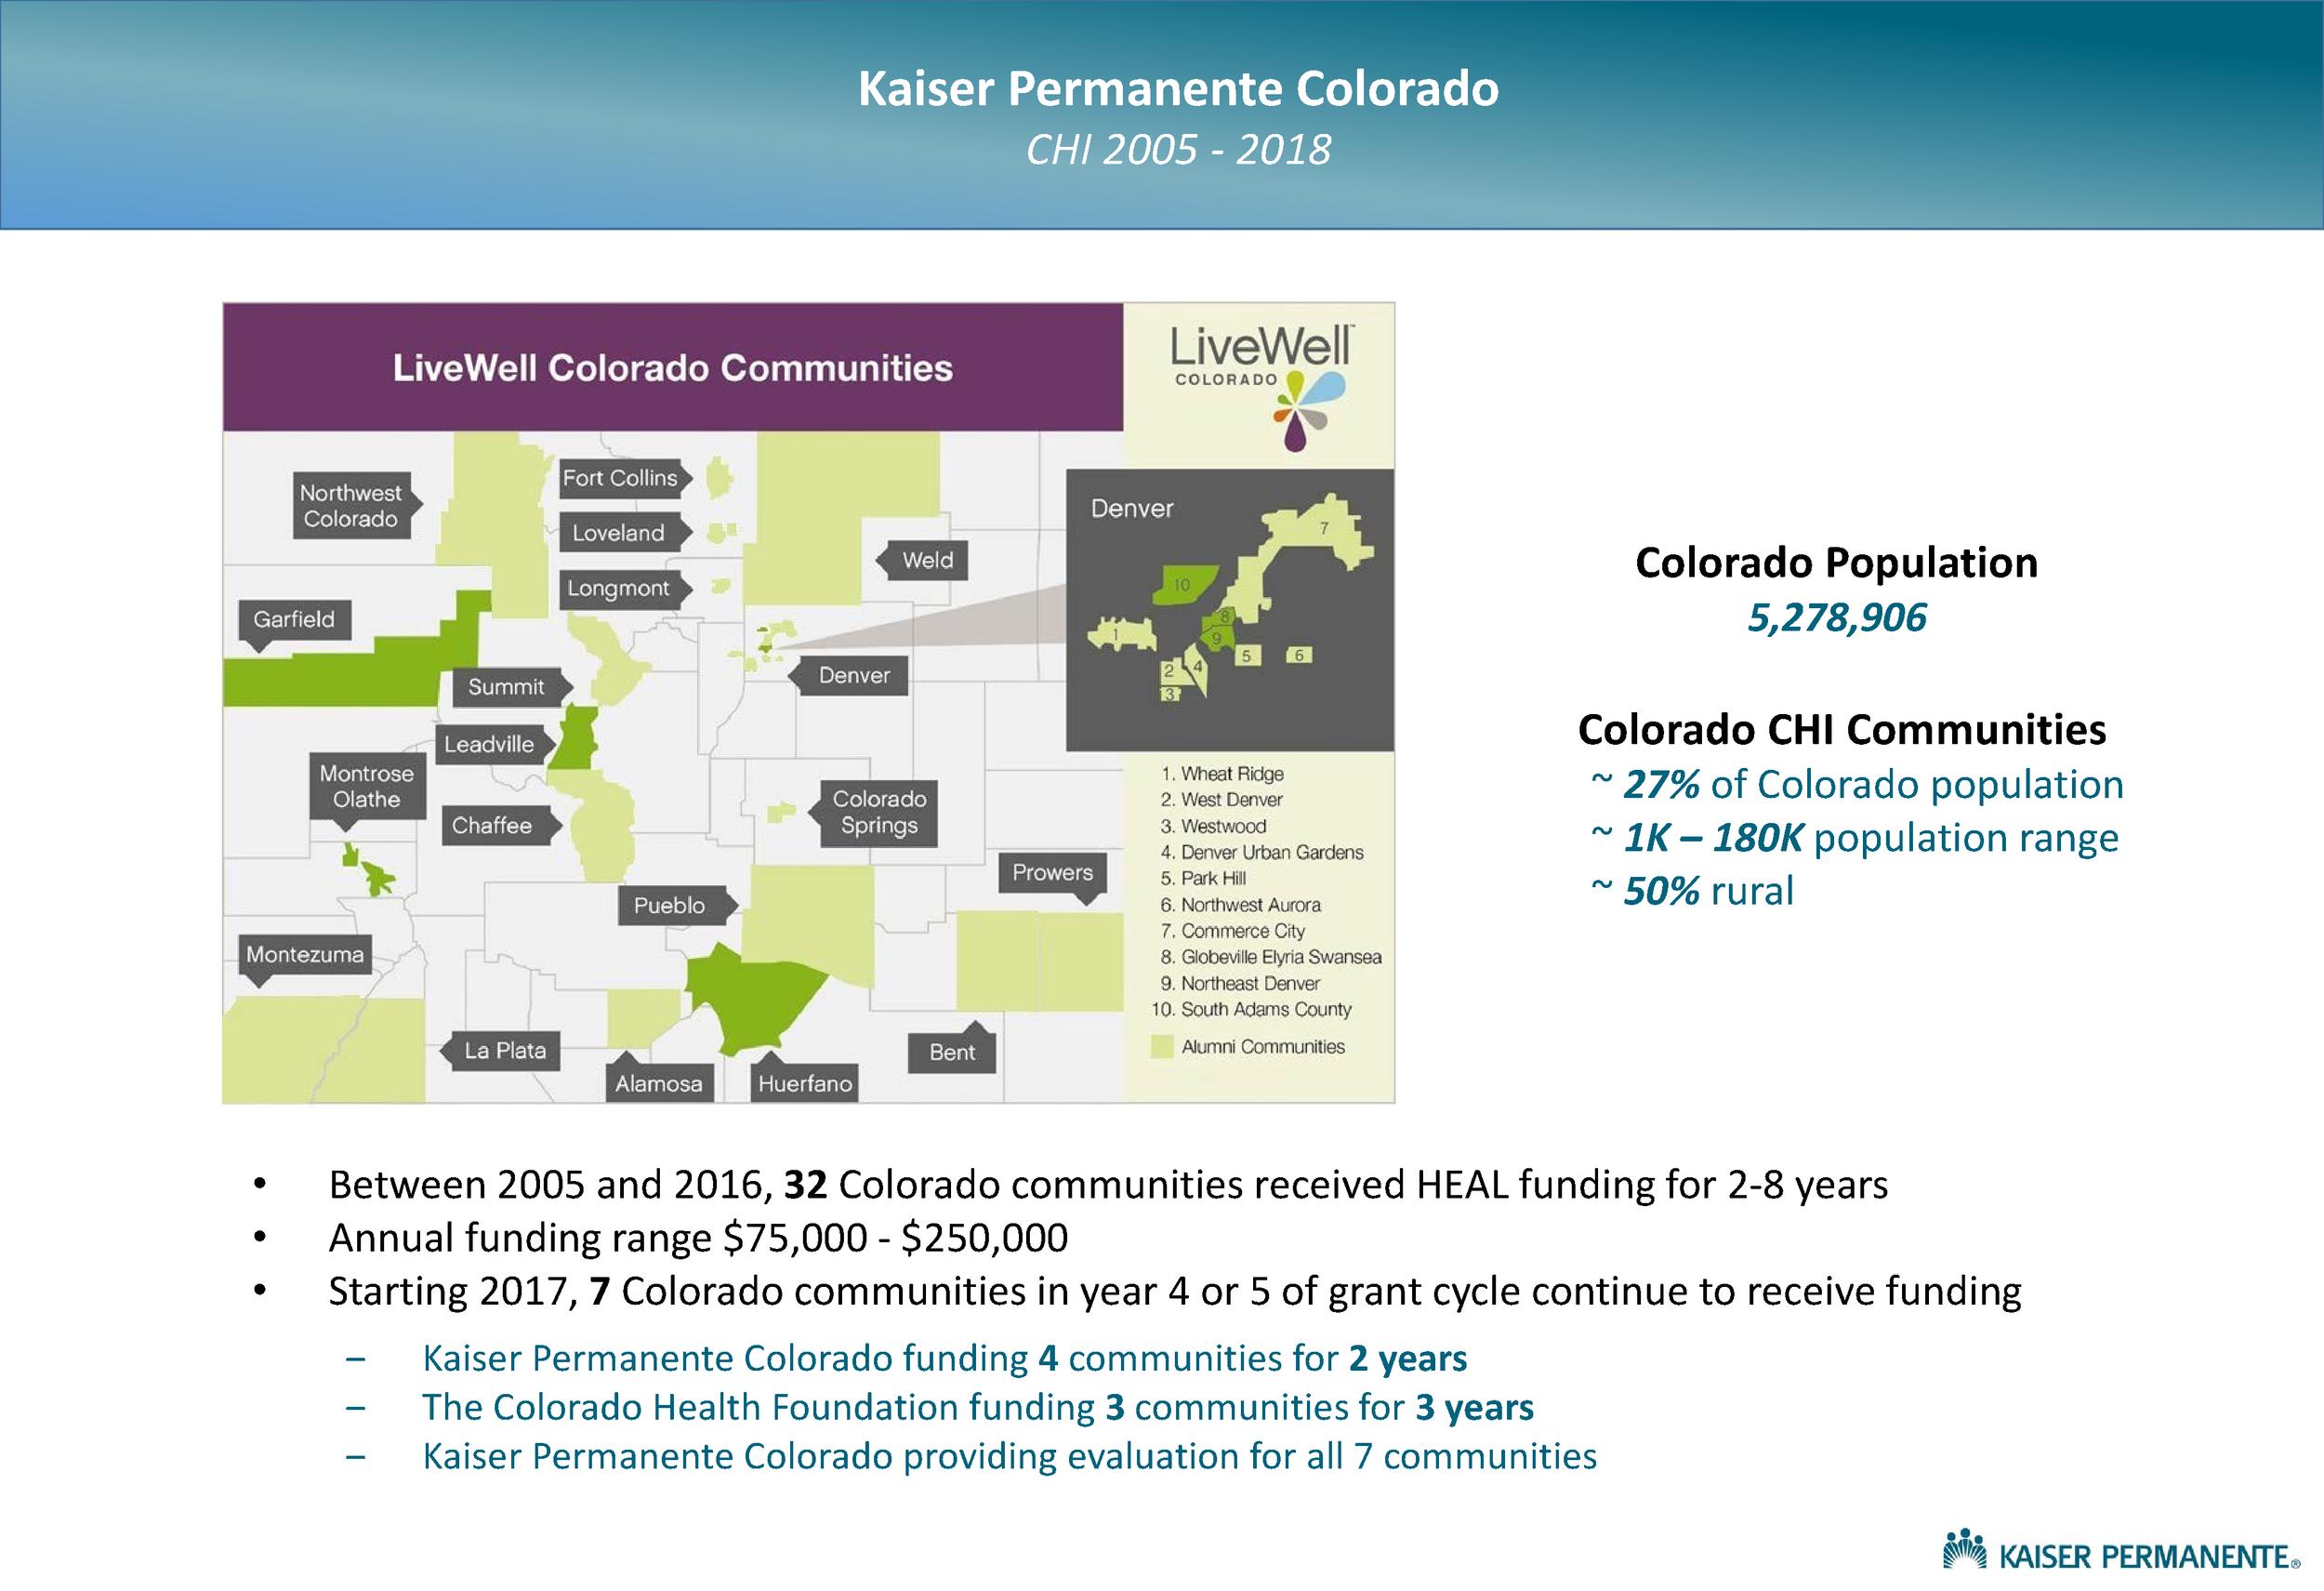 LiveWell Colorado Evaluation Summary 2017